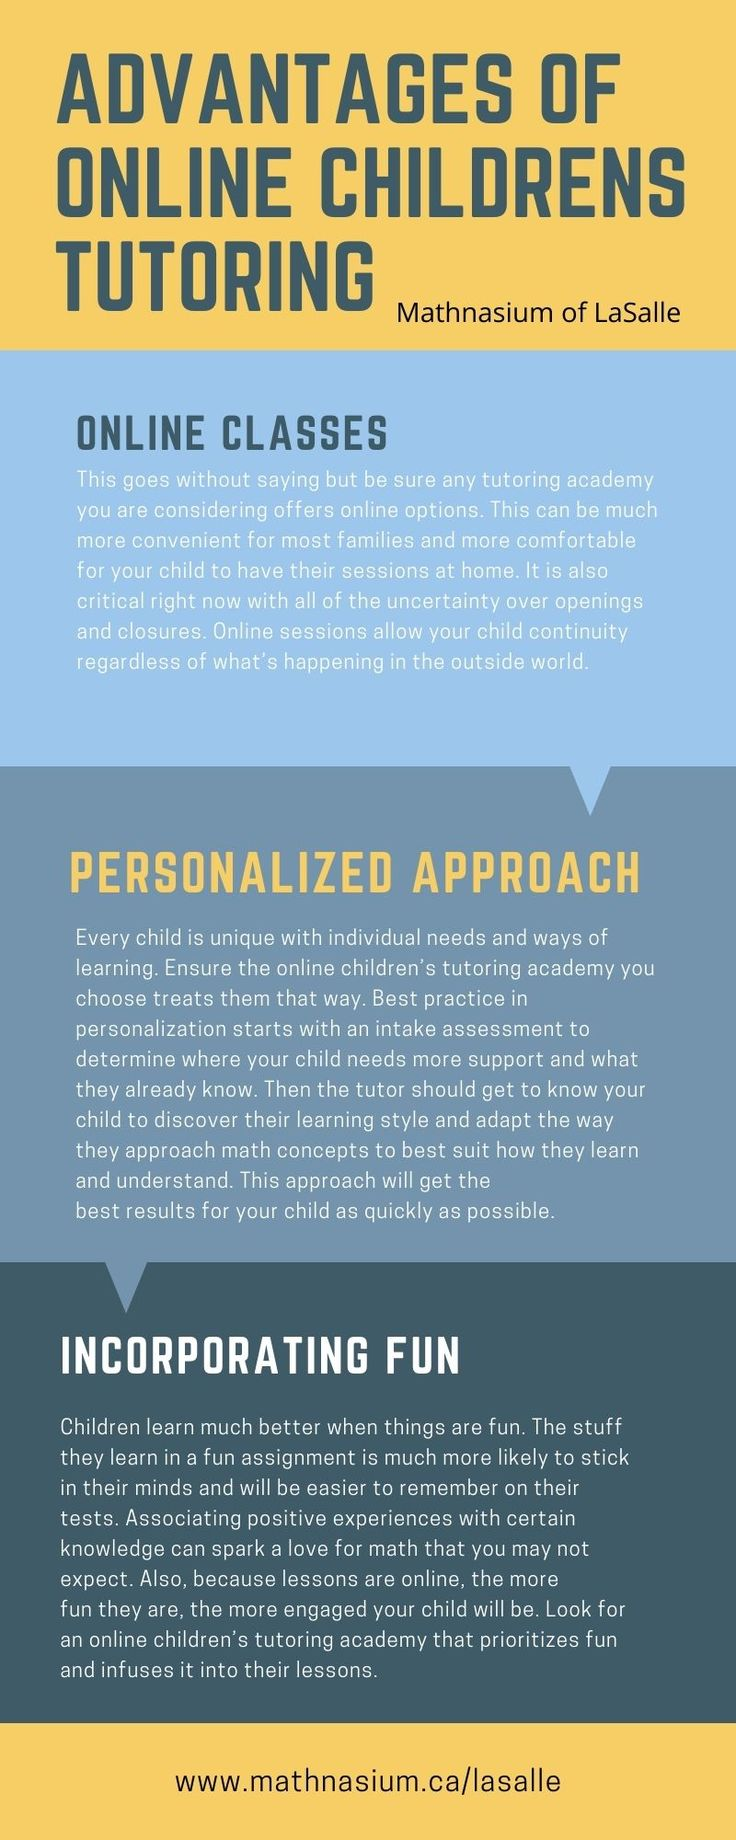 Advantages of online children's tutoring